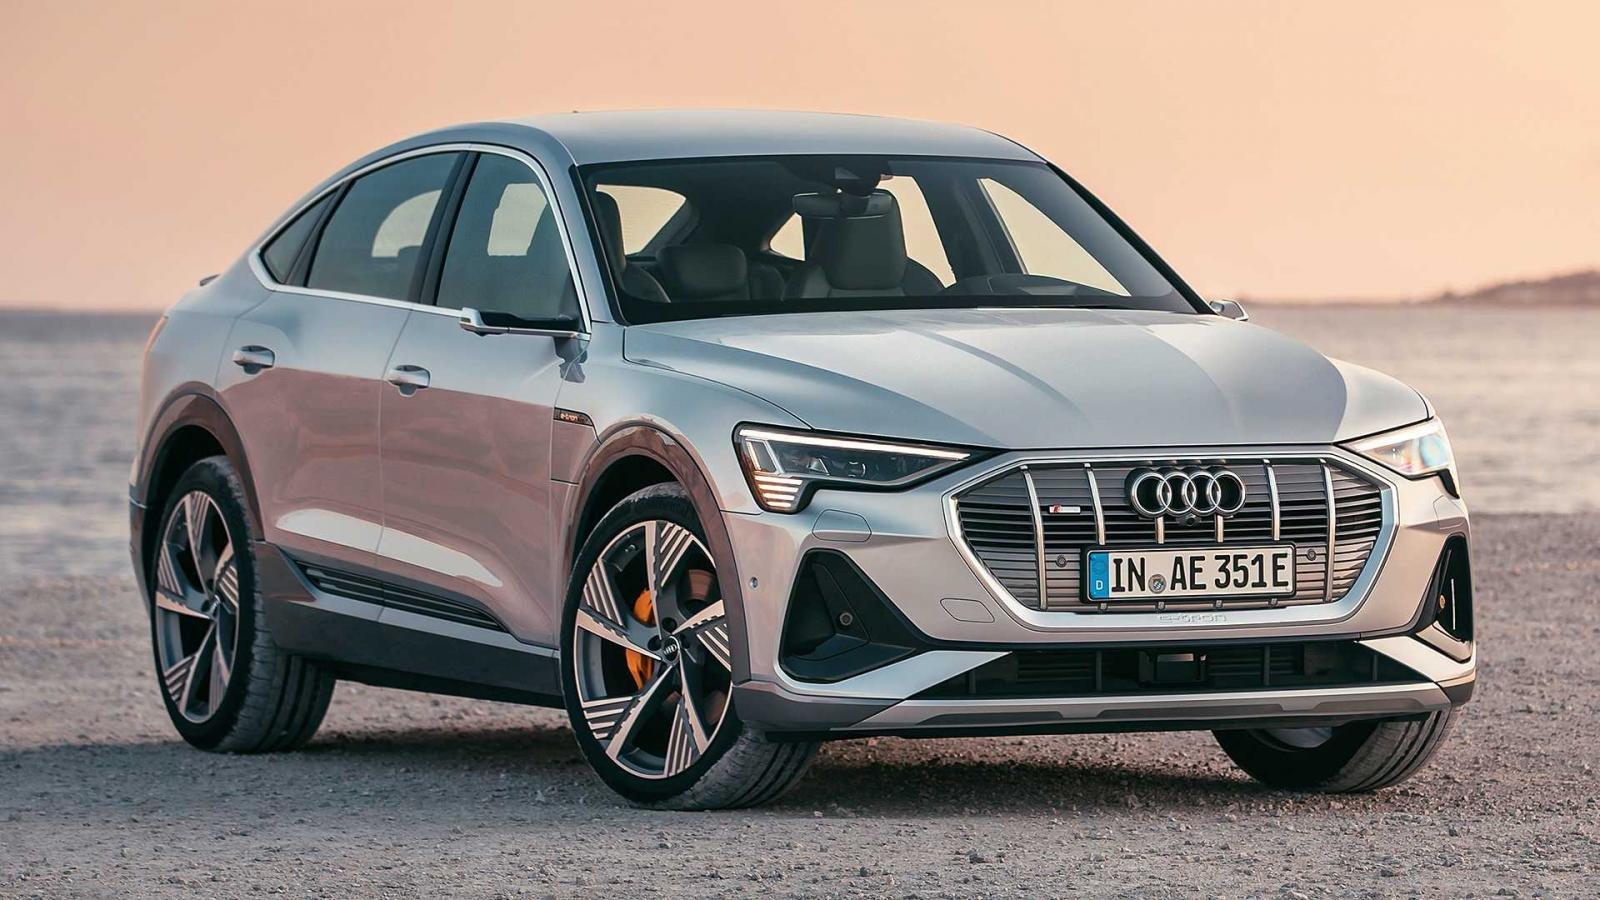 Xe điện Audi E-Tron Sportback 2020 ra mắt